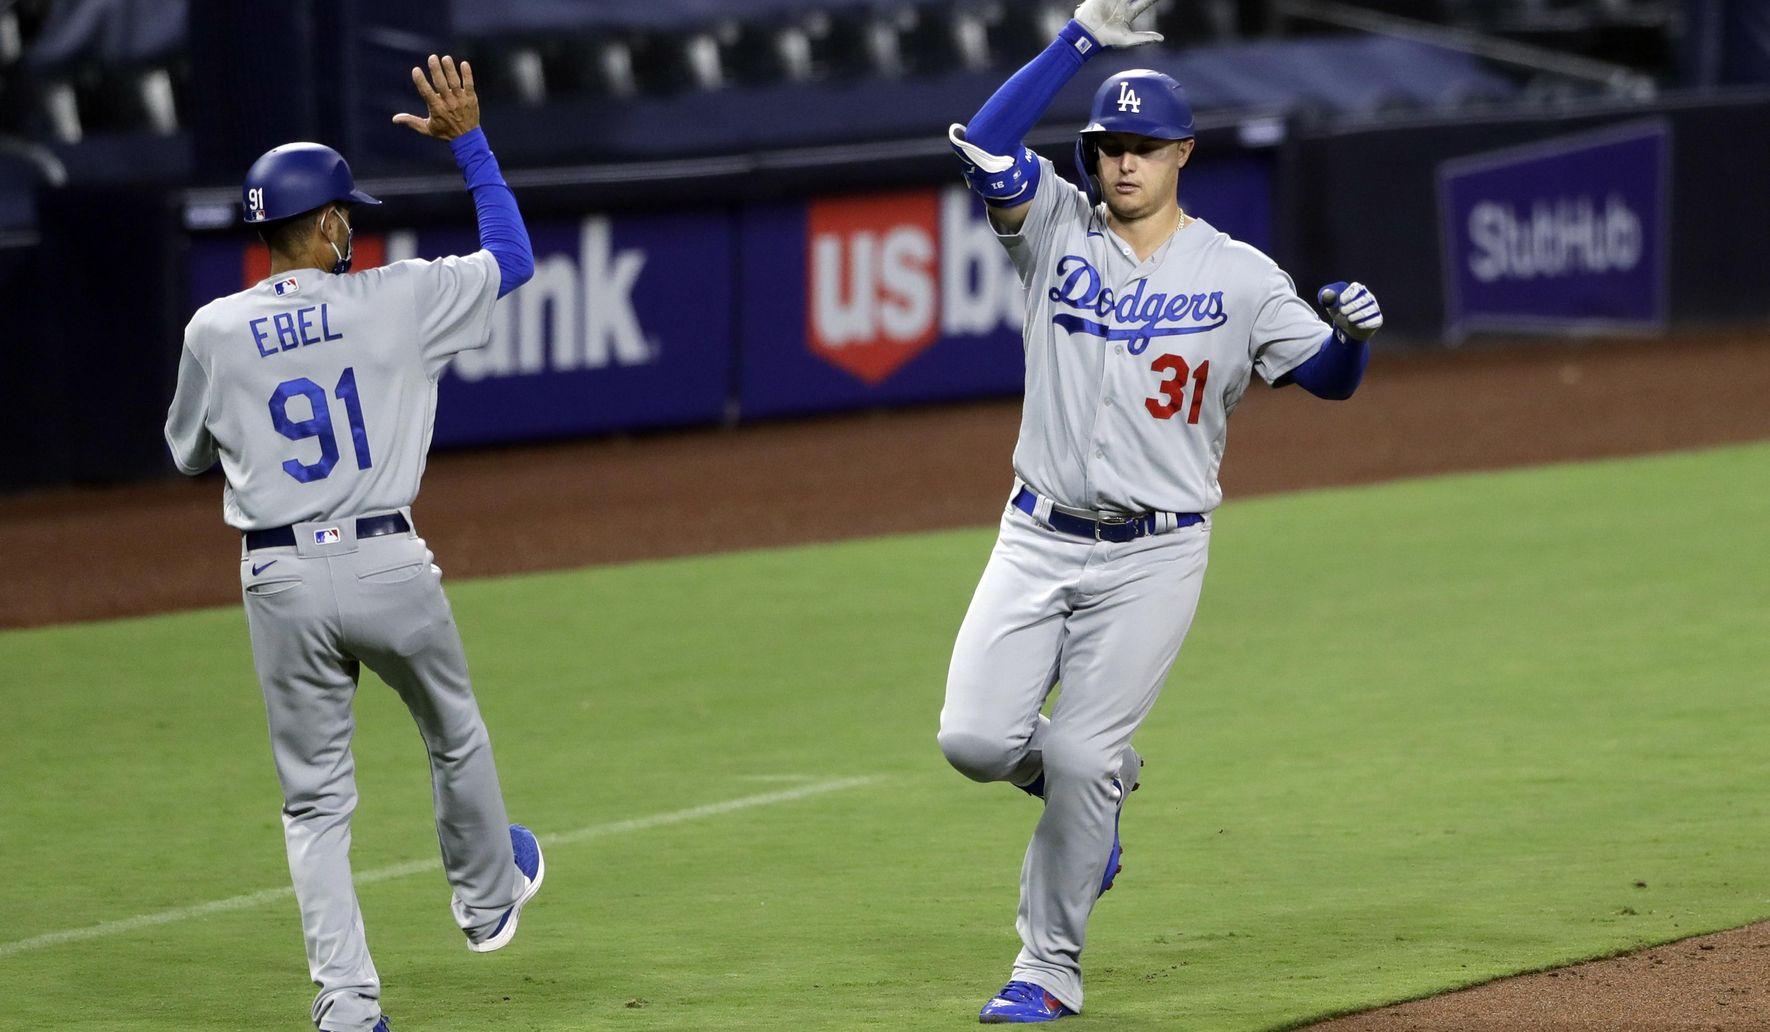 Dodgers_padres_baseball_03221_c0-148-3543-2213_s1770x1032